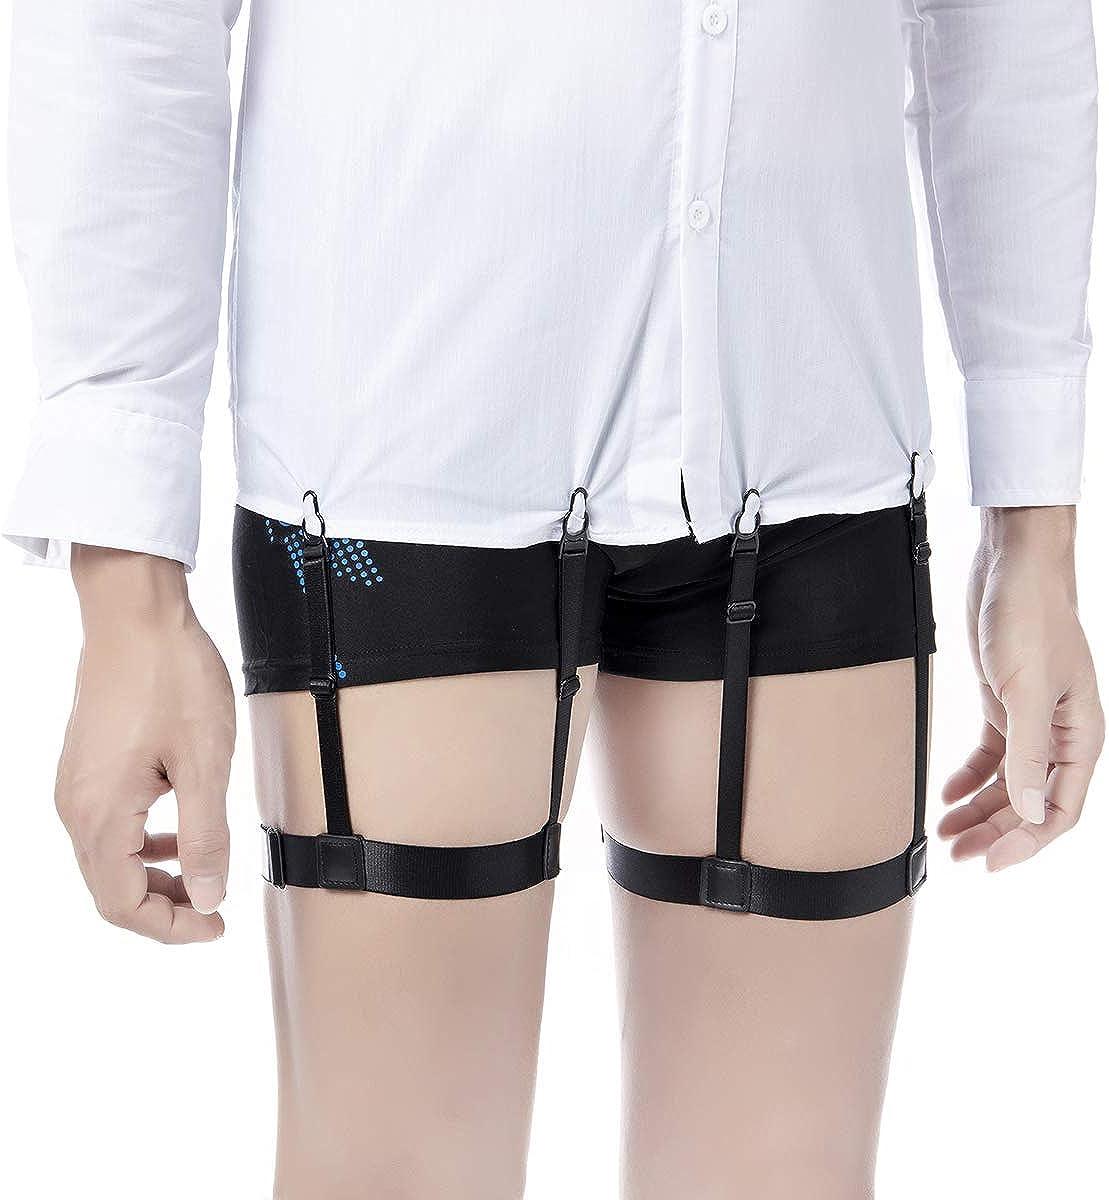 Mens Shirt Stays Garters Suspenders Shirt Holder Straps Non-slip Locking Clamps Keep Shirt Tucked